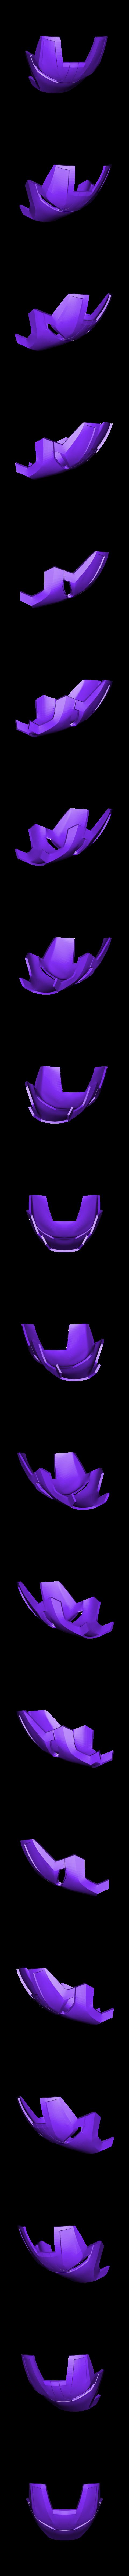 mask.stl Download free STL file IRON MAN Mark 42 • 3D print design, kimjh